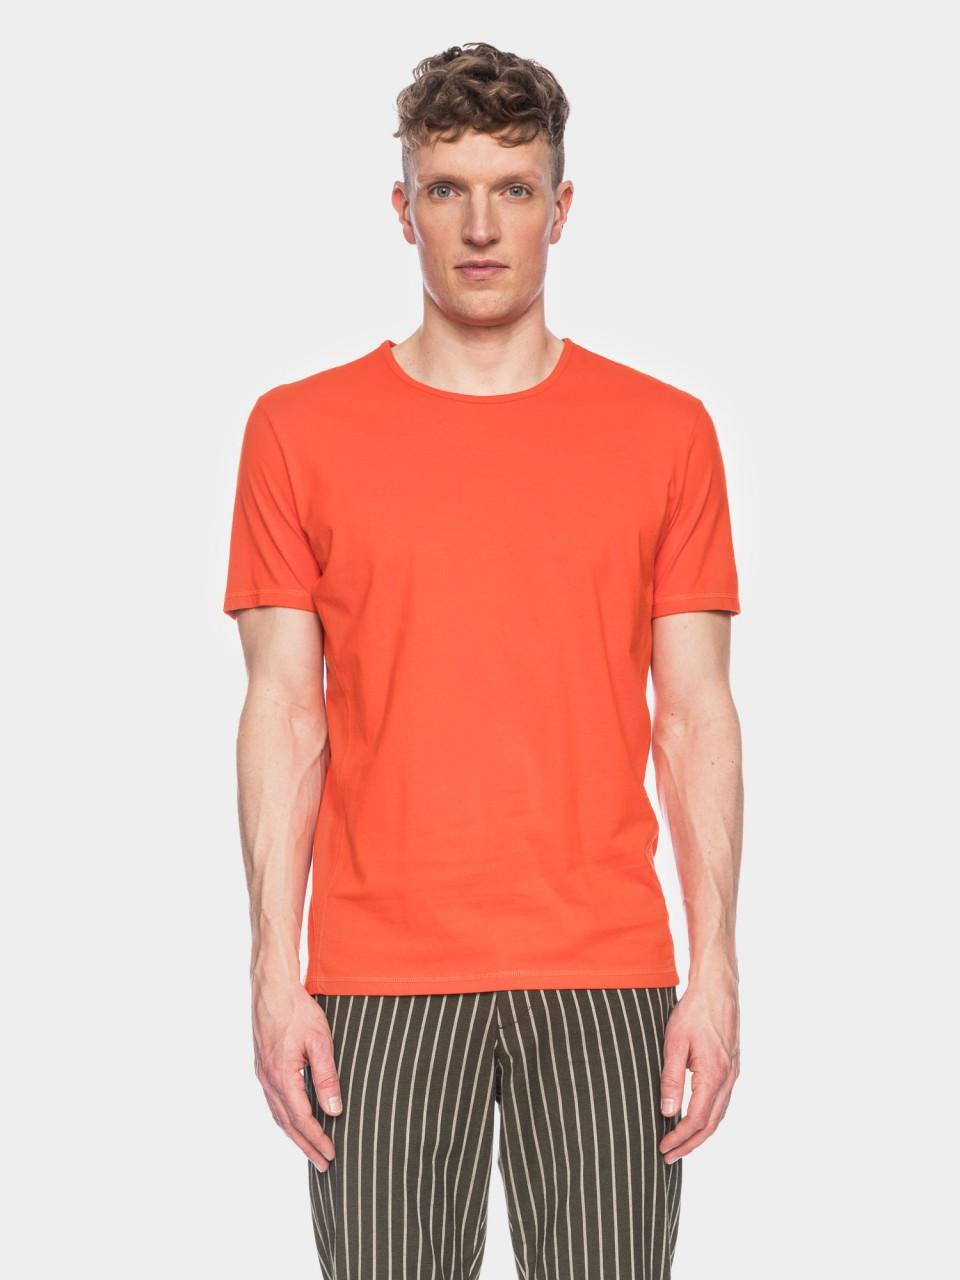 T-Shirt Olek GOTS OC ORGC